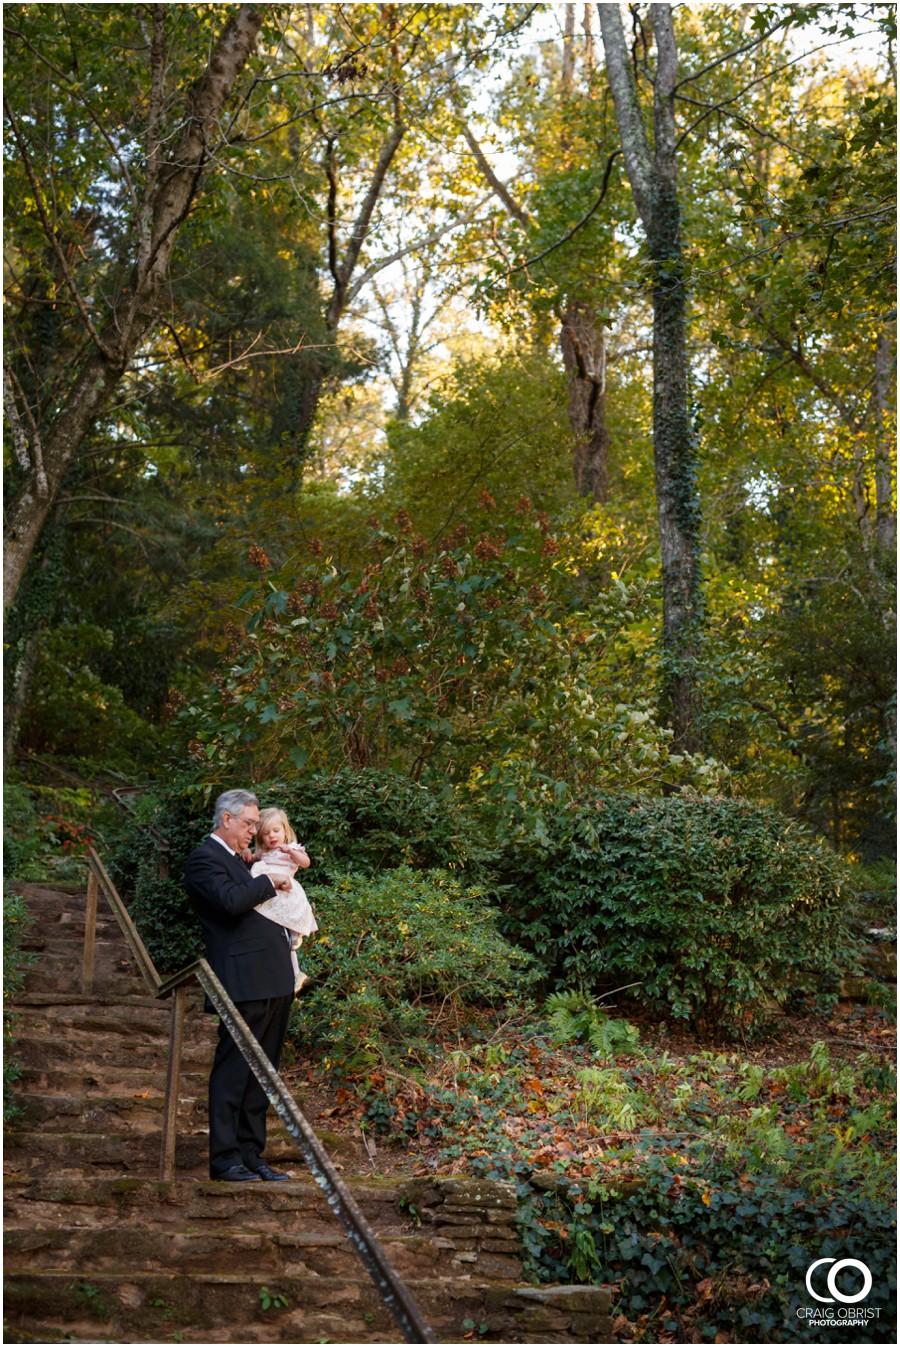 Dunaway gardens Wedding Fairytale Disney Portraits_0074.jpg